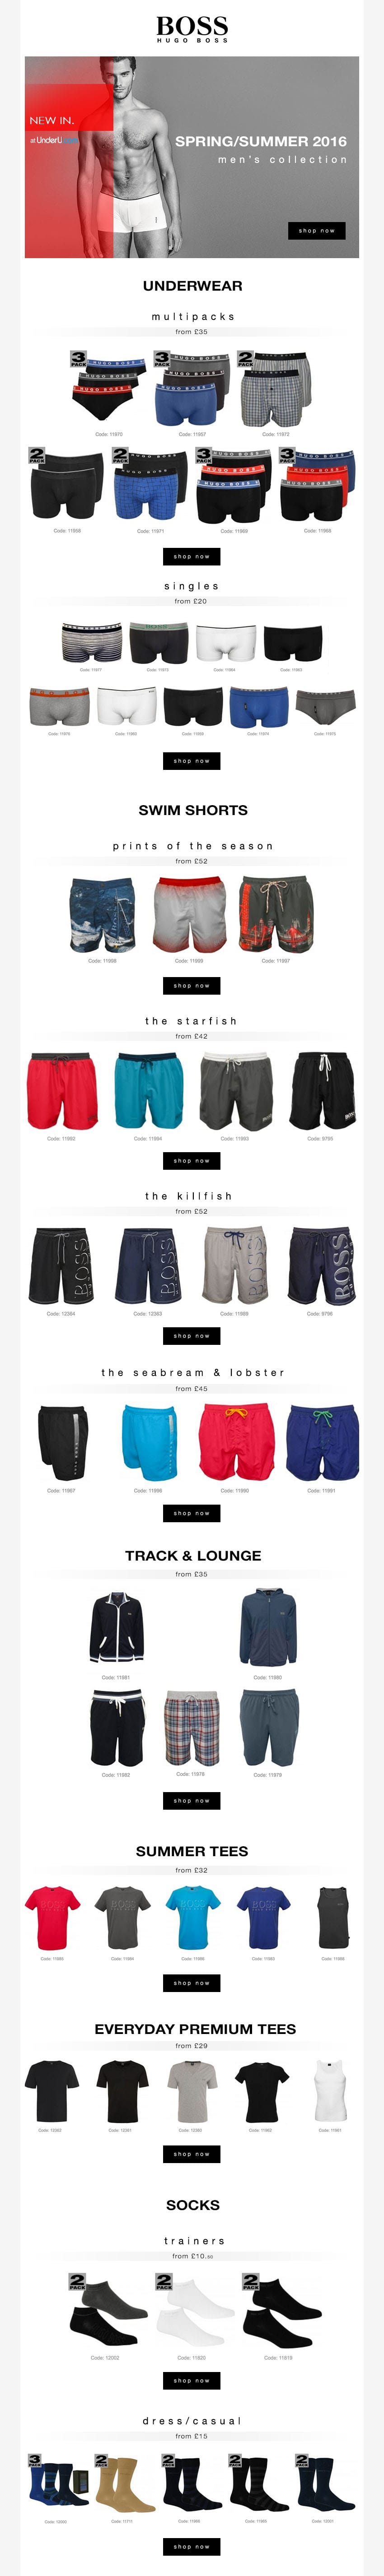 Hugo Boss Underwear & Hugo Boss Swimwear Collection 2016 | UnderU